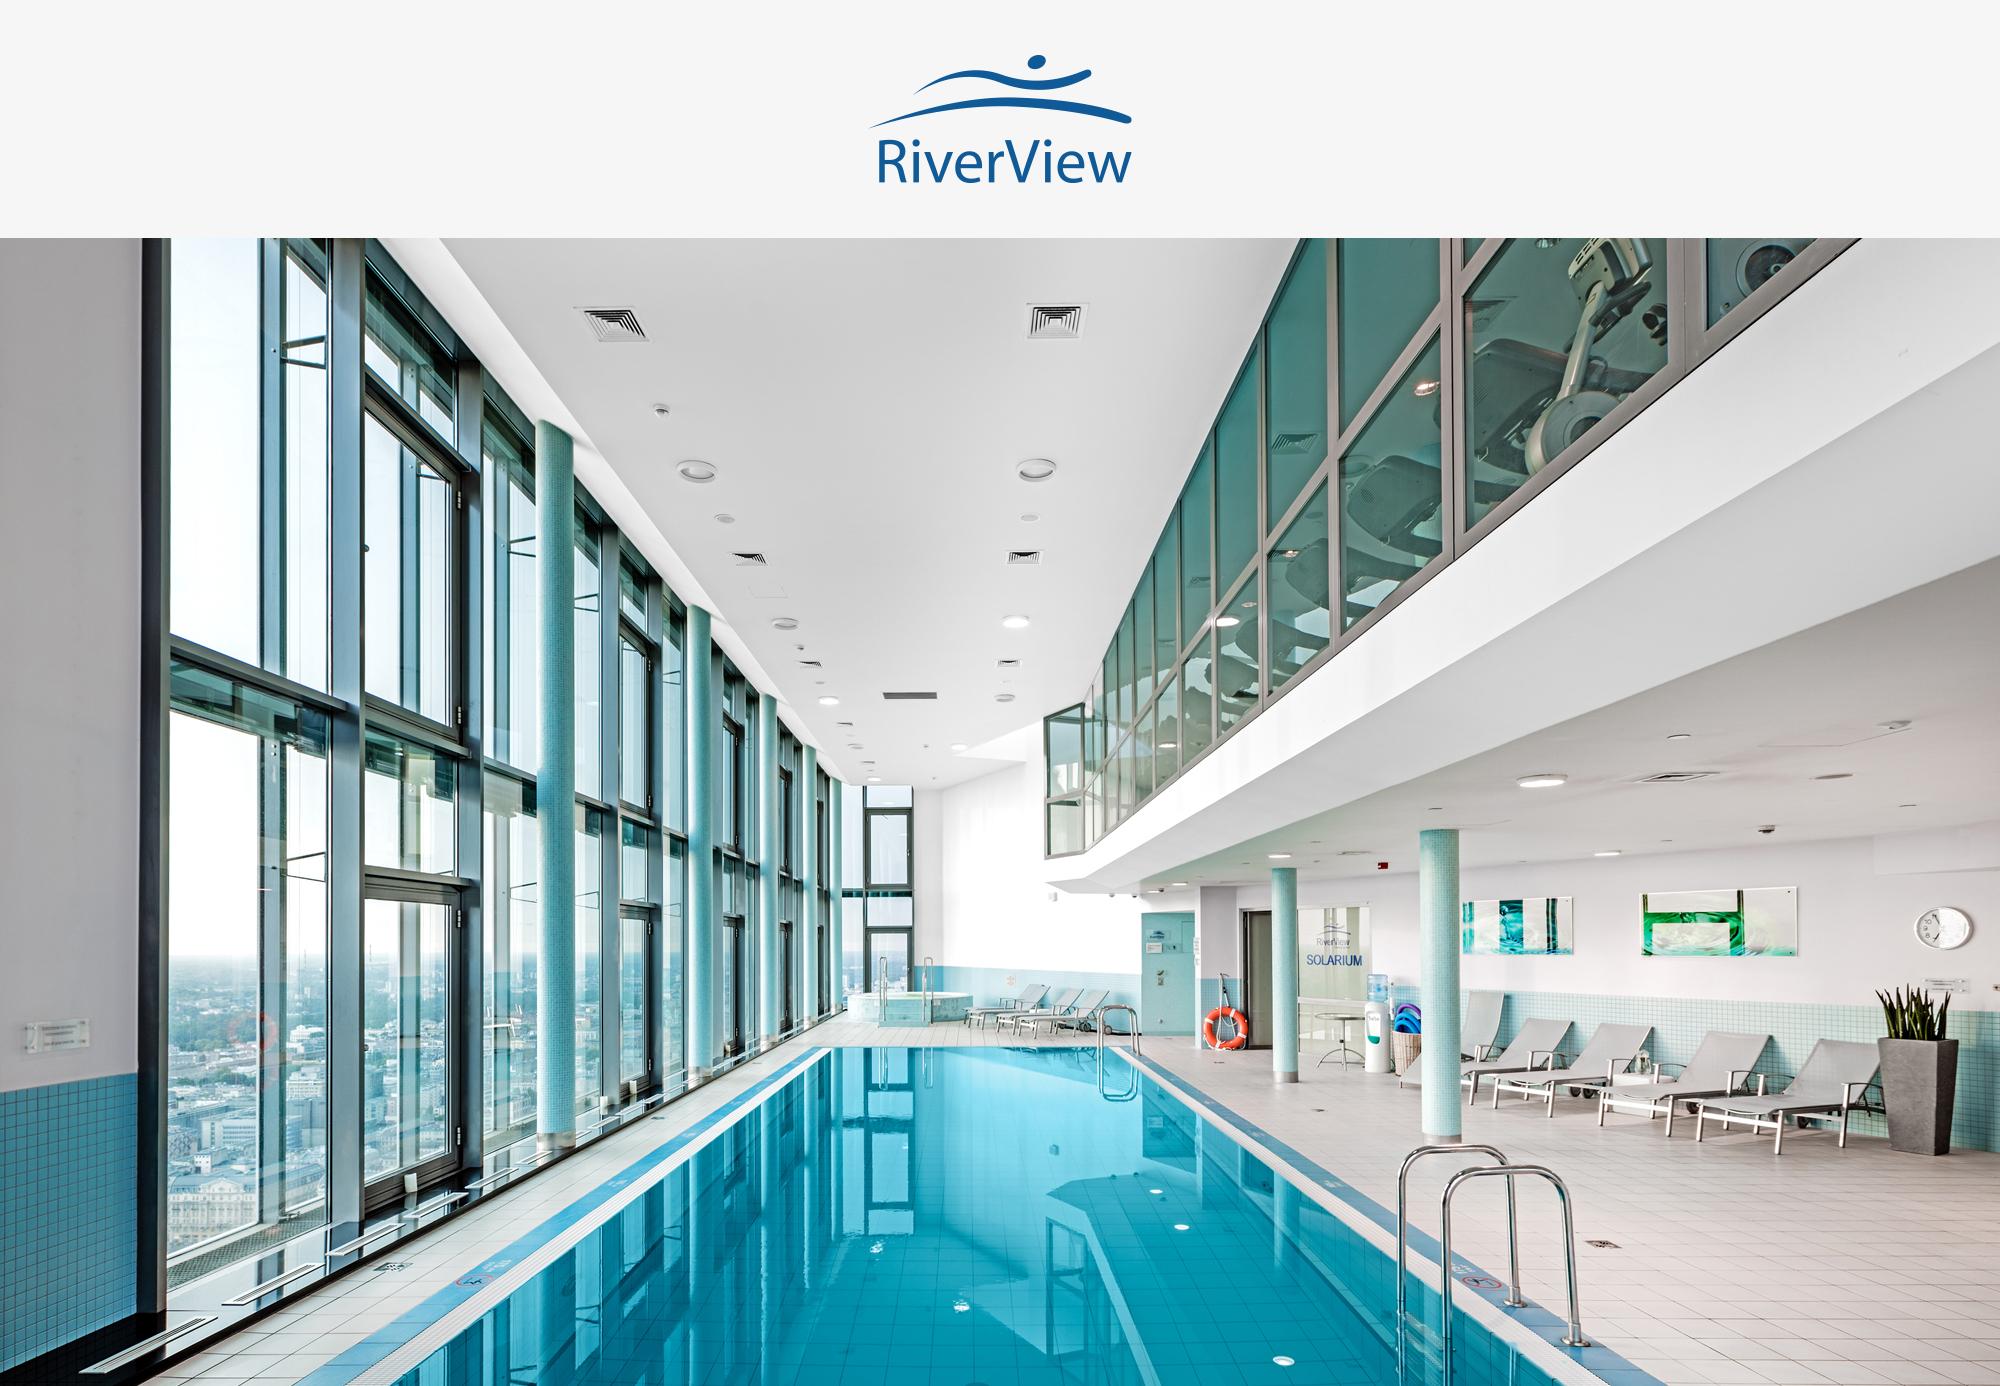 BlueSky – 30-days membership at RiverView Wellness Centre